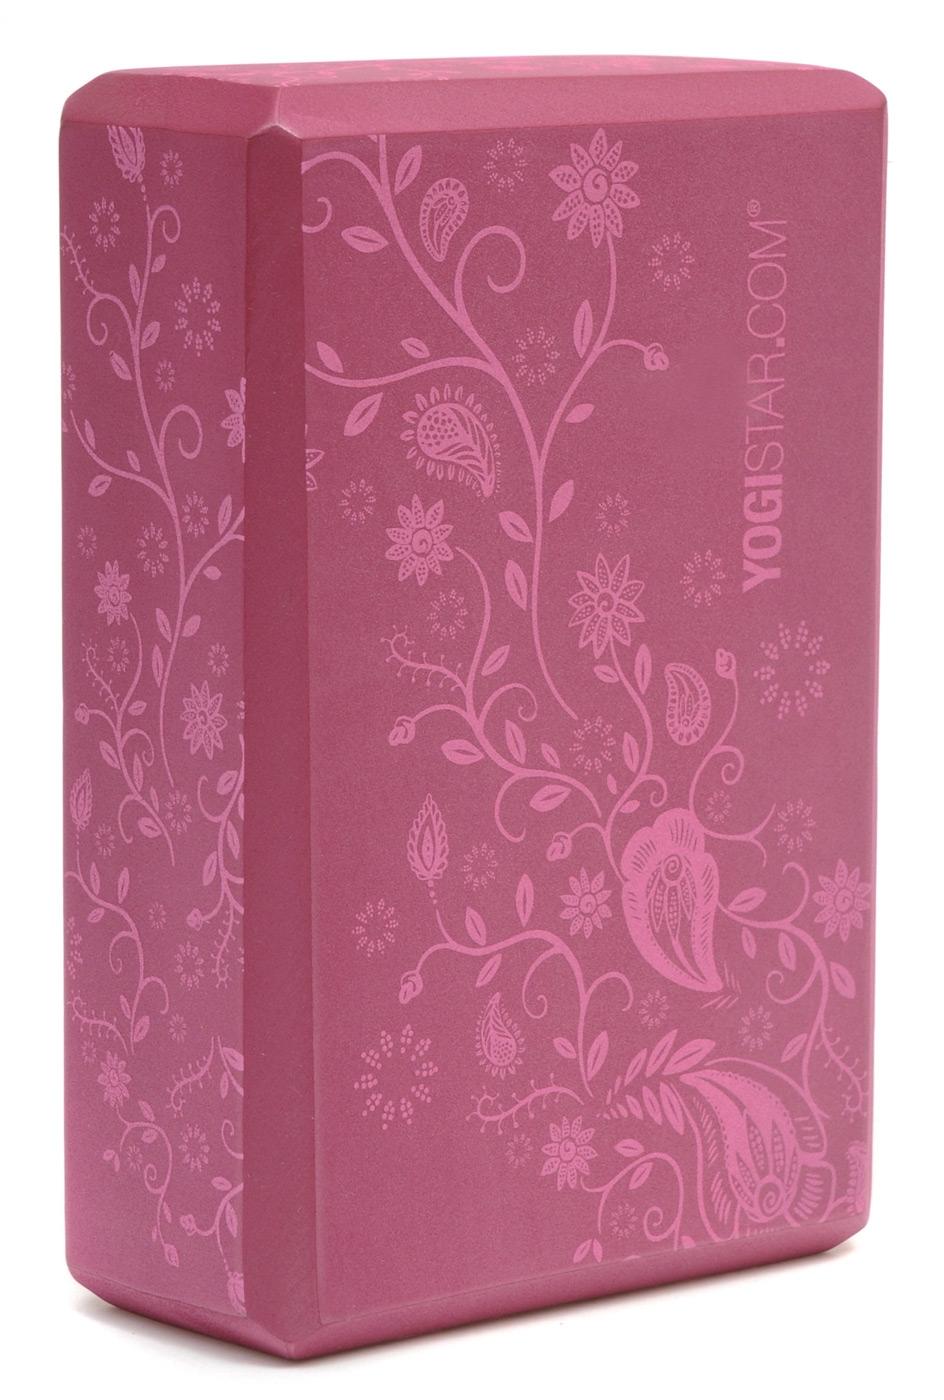 Yoga Block Indian Flower Wine Red Buy Online At Yogistar Com Yoga Equipment Yoga